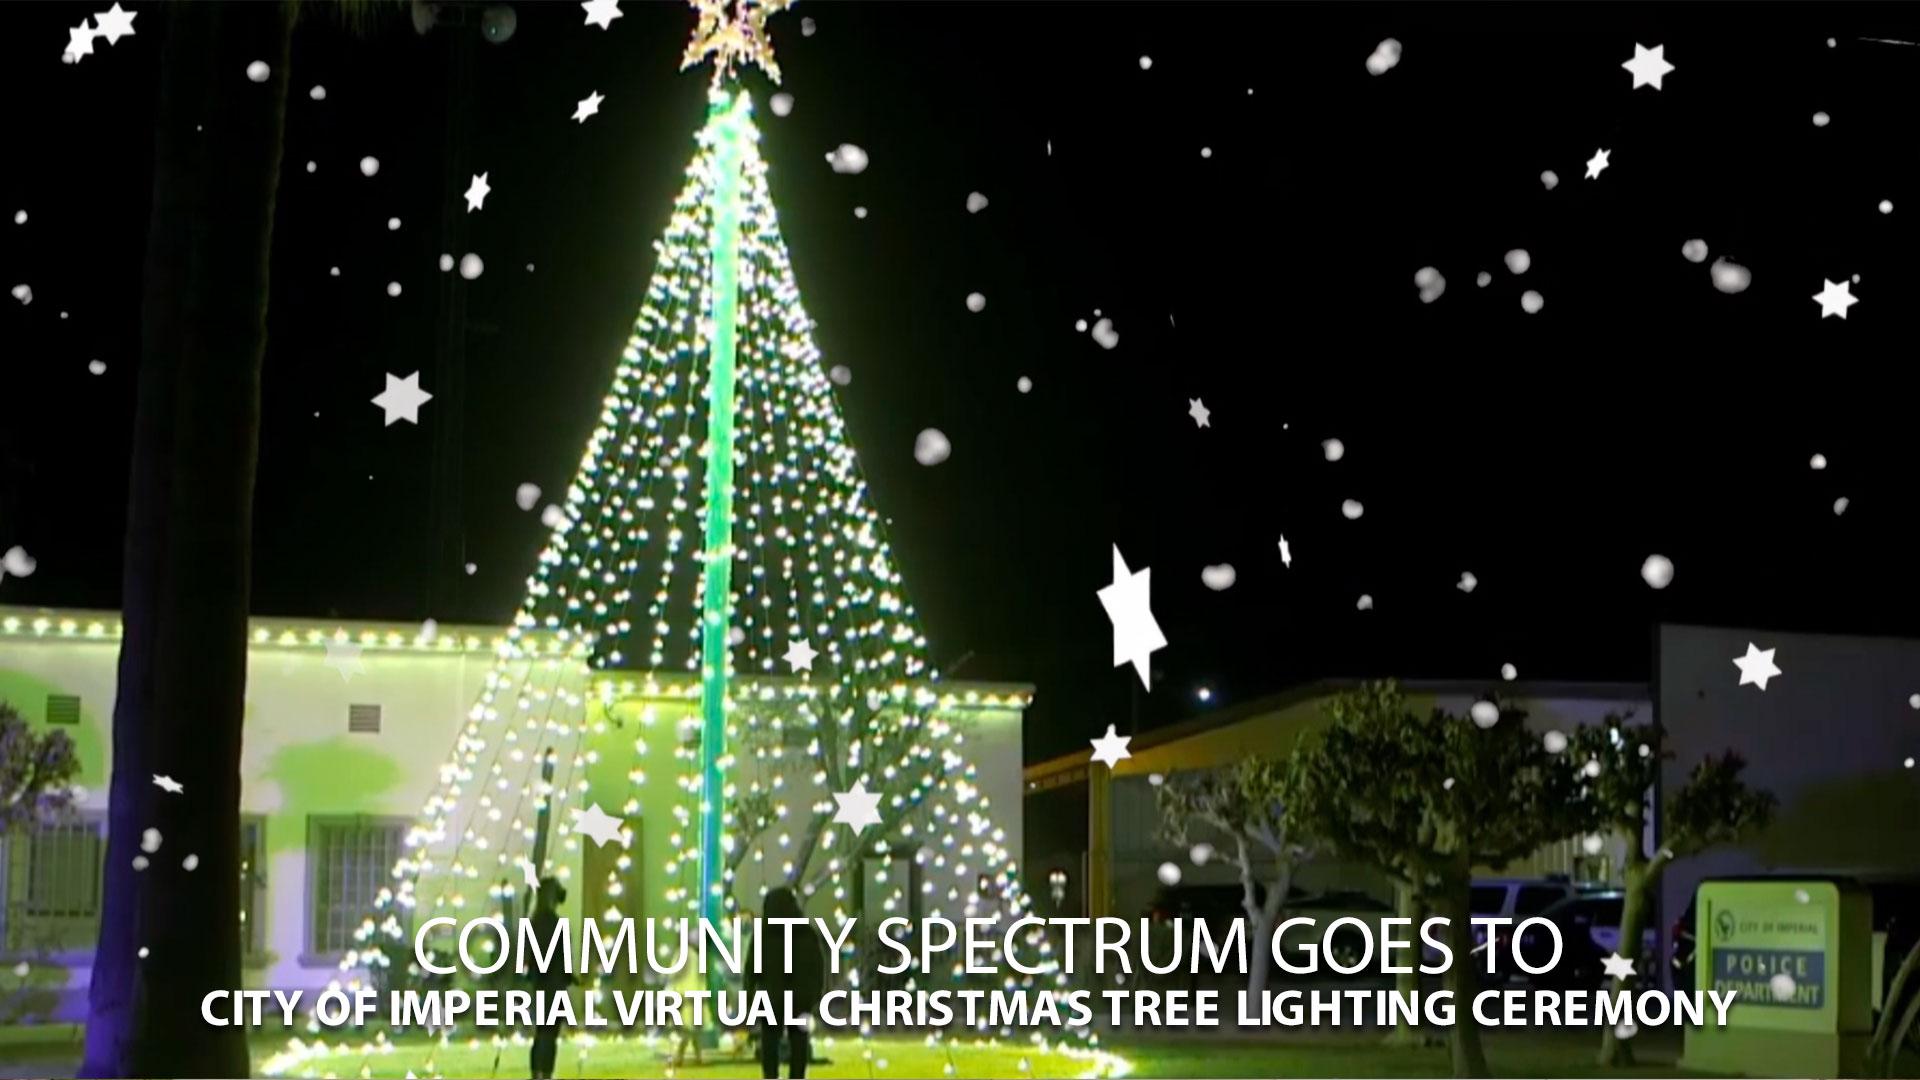 City of Imperial virtual christmas tree lighting ceremony